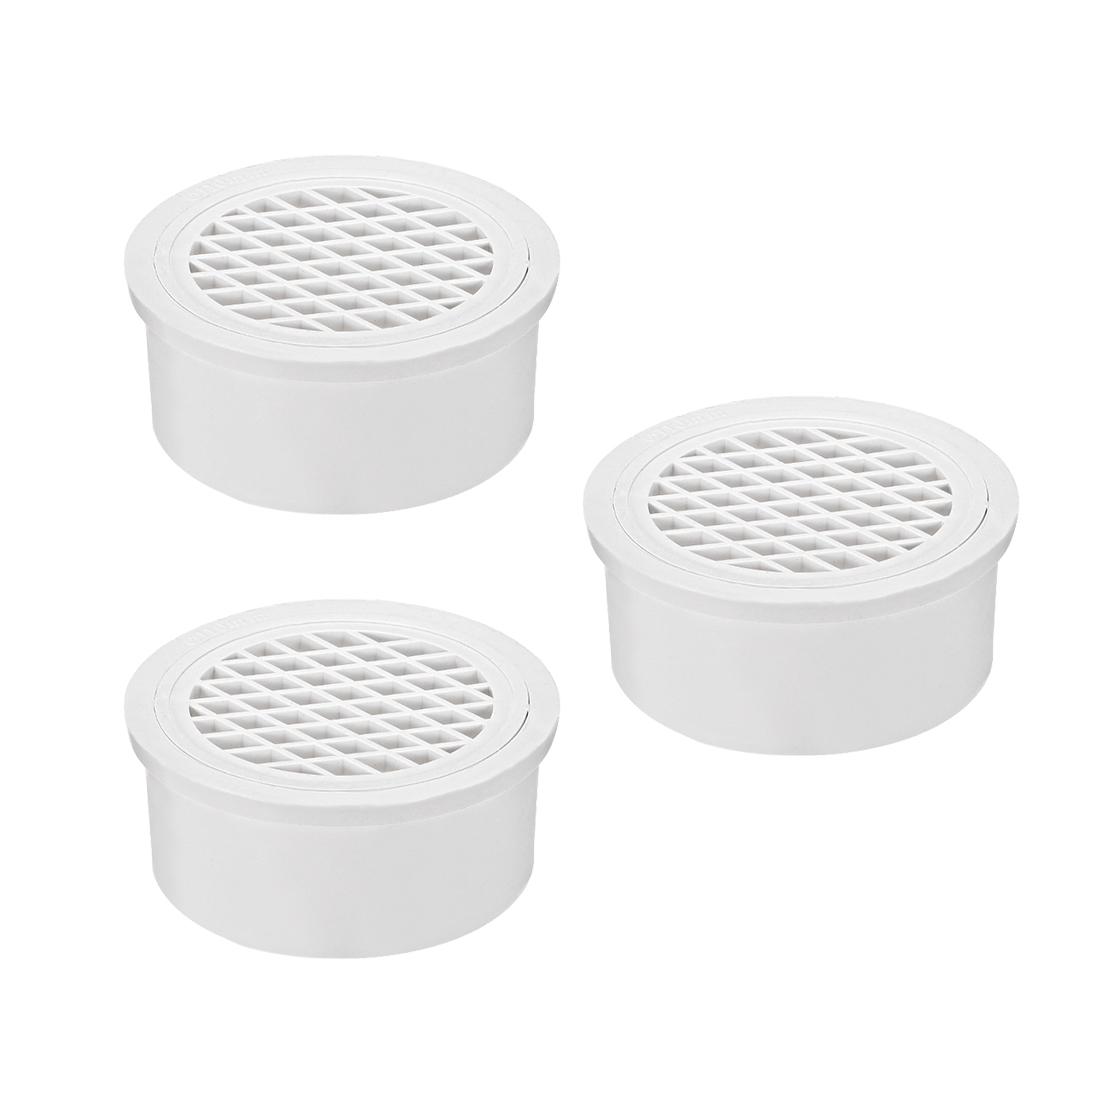 PVC Snap-In Floor Drain 4-inch Bathroom Sink And Tub Drain Strainers 3pcs